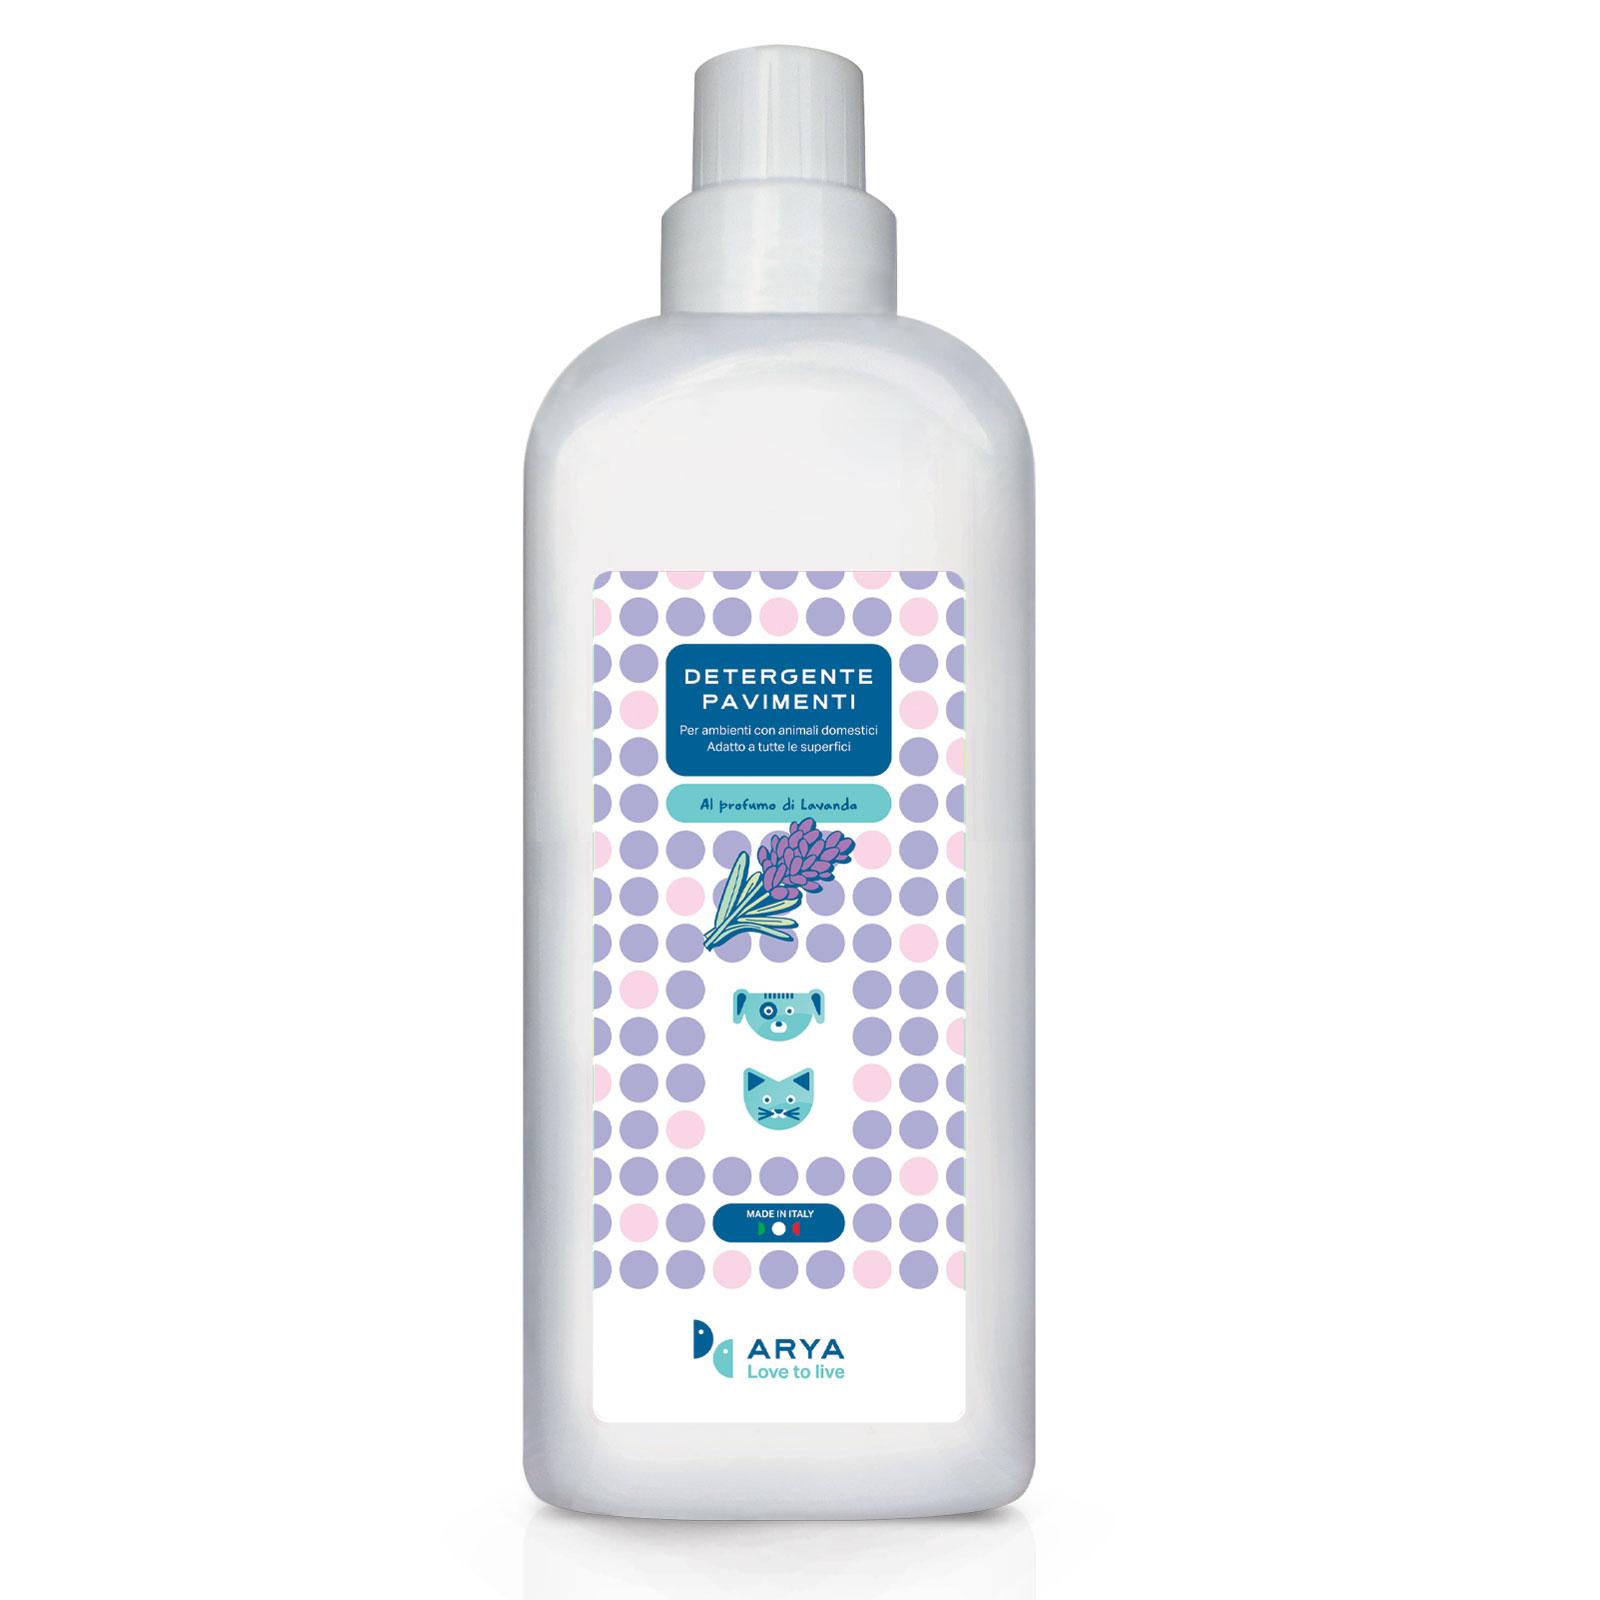 Detergente Pavimenti Lavanda